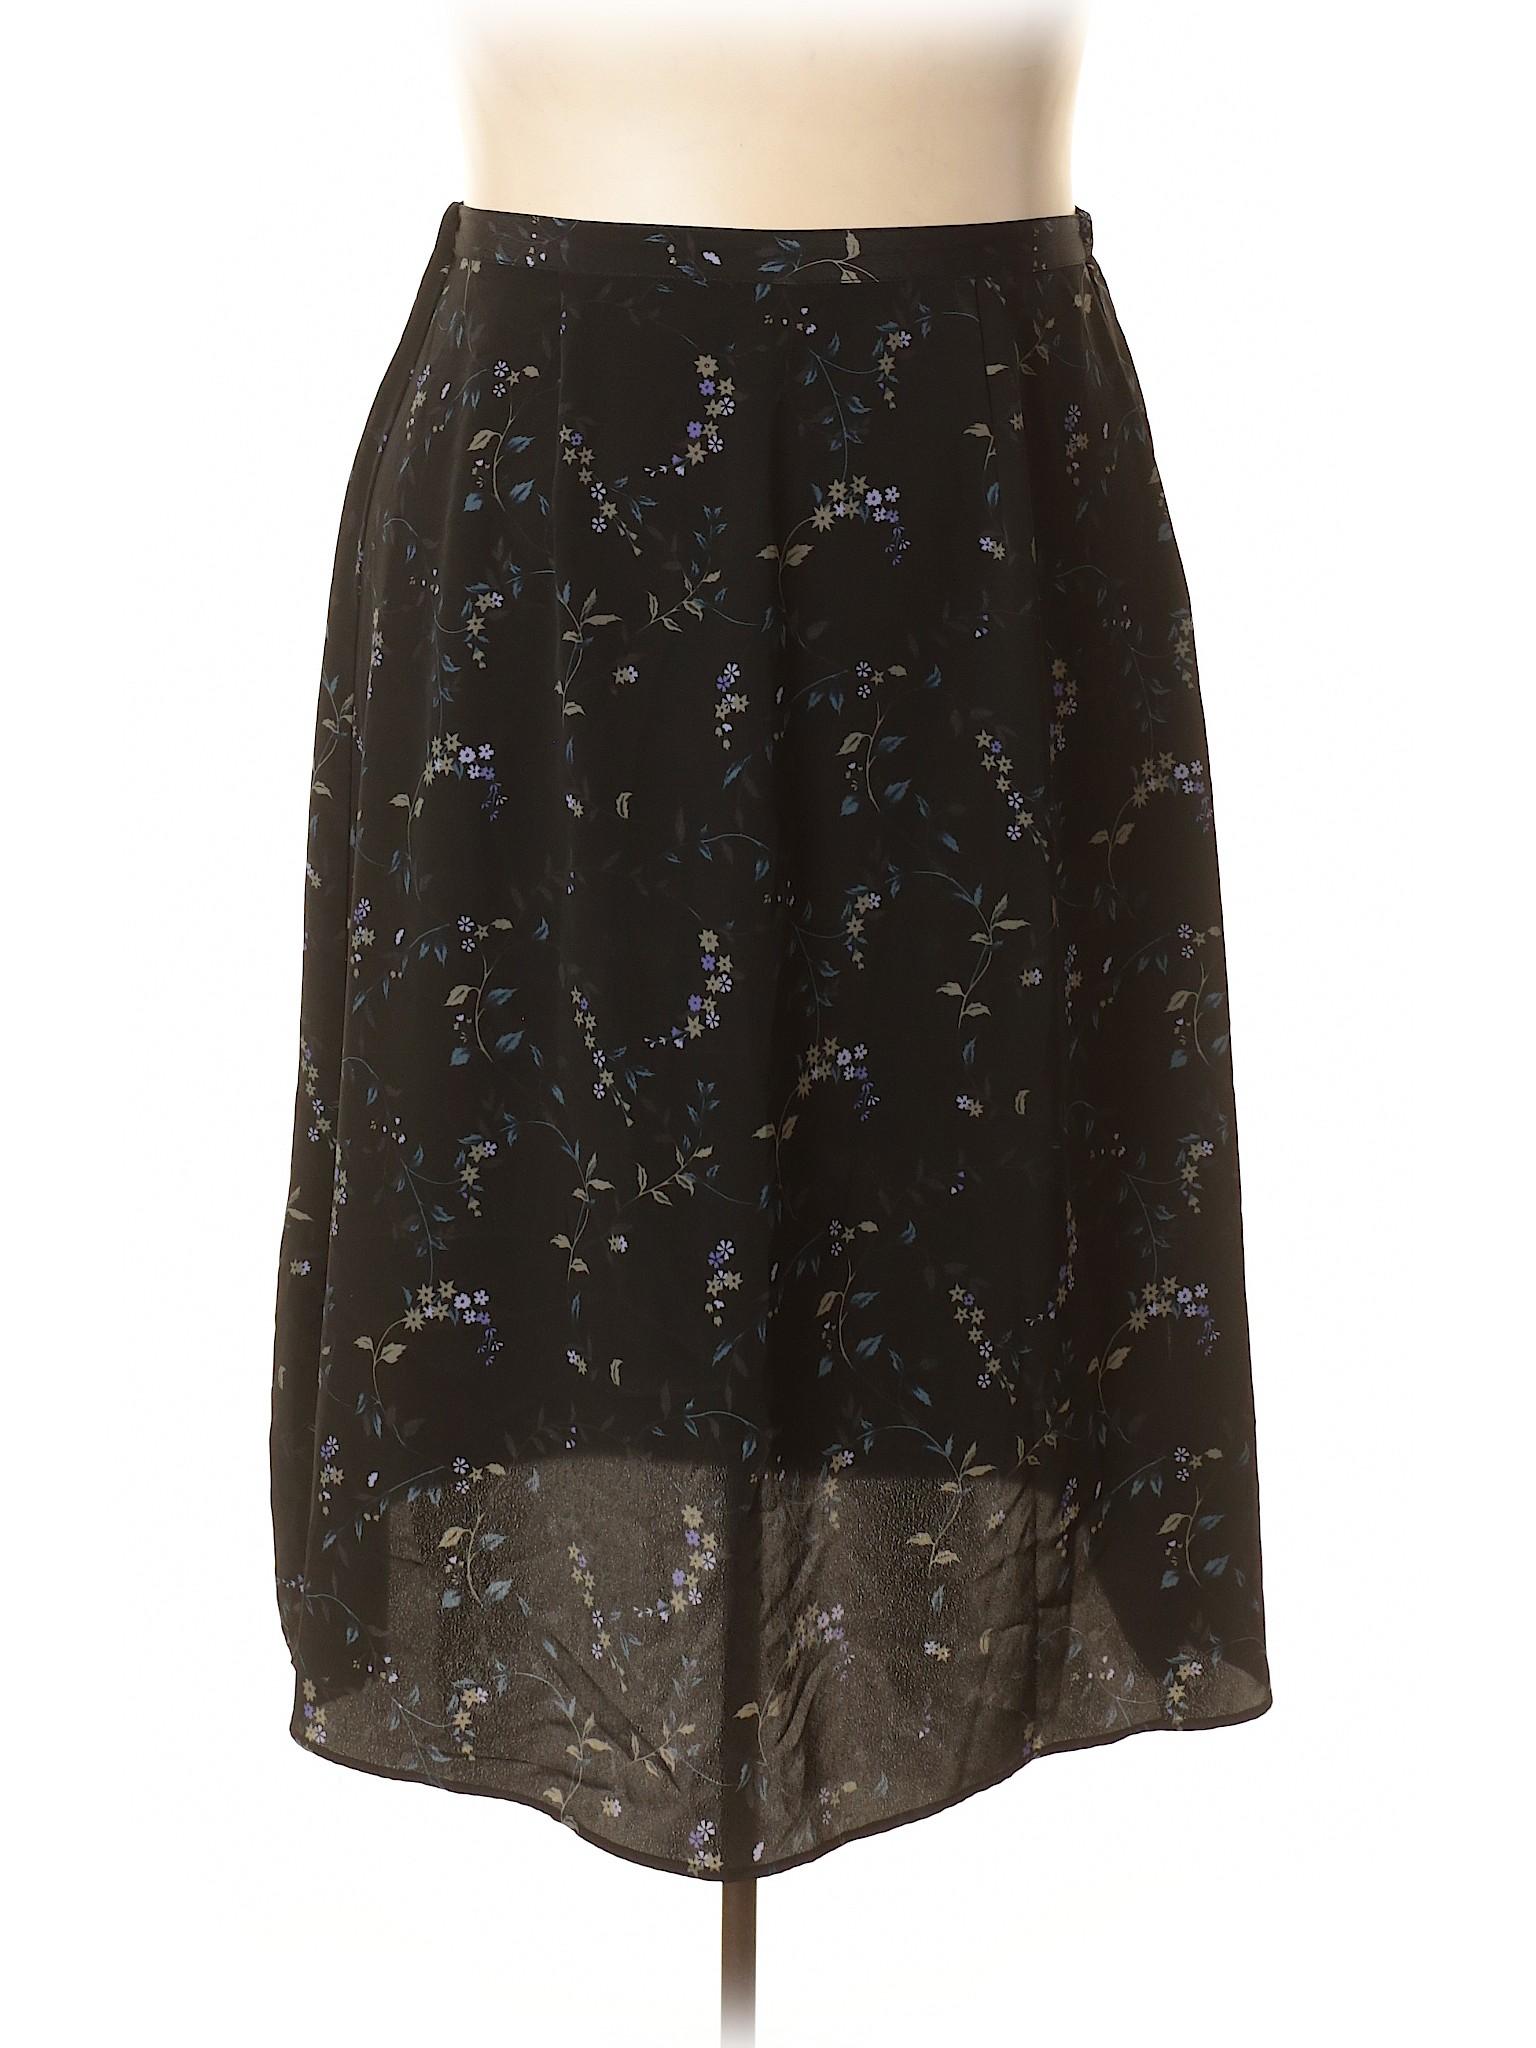 Casual Casual Casual Boutique Boutique Boutique Skirt Skirt wFHaxqBvv